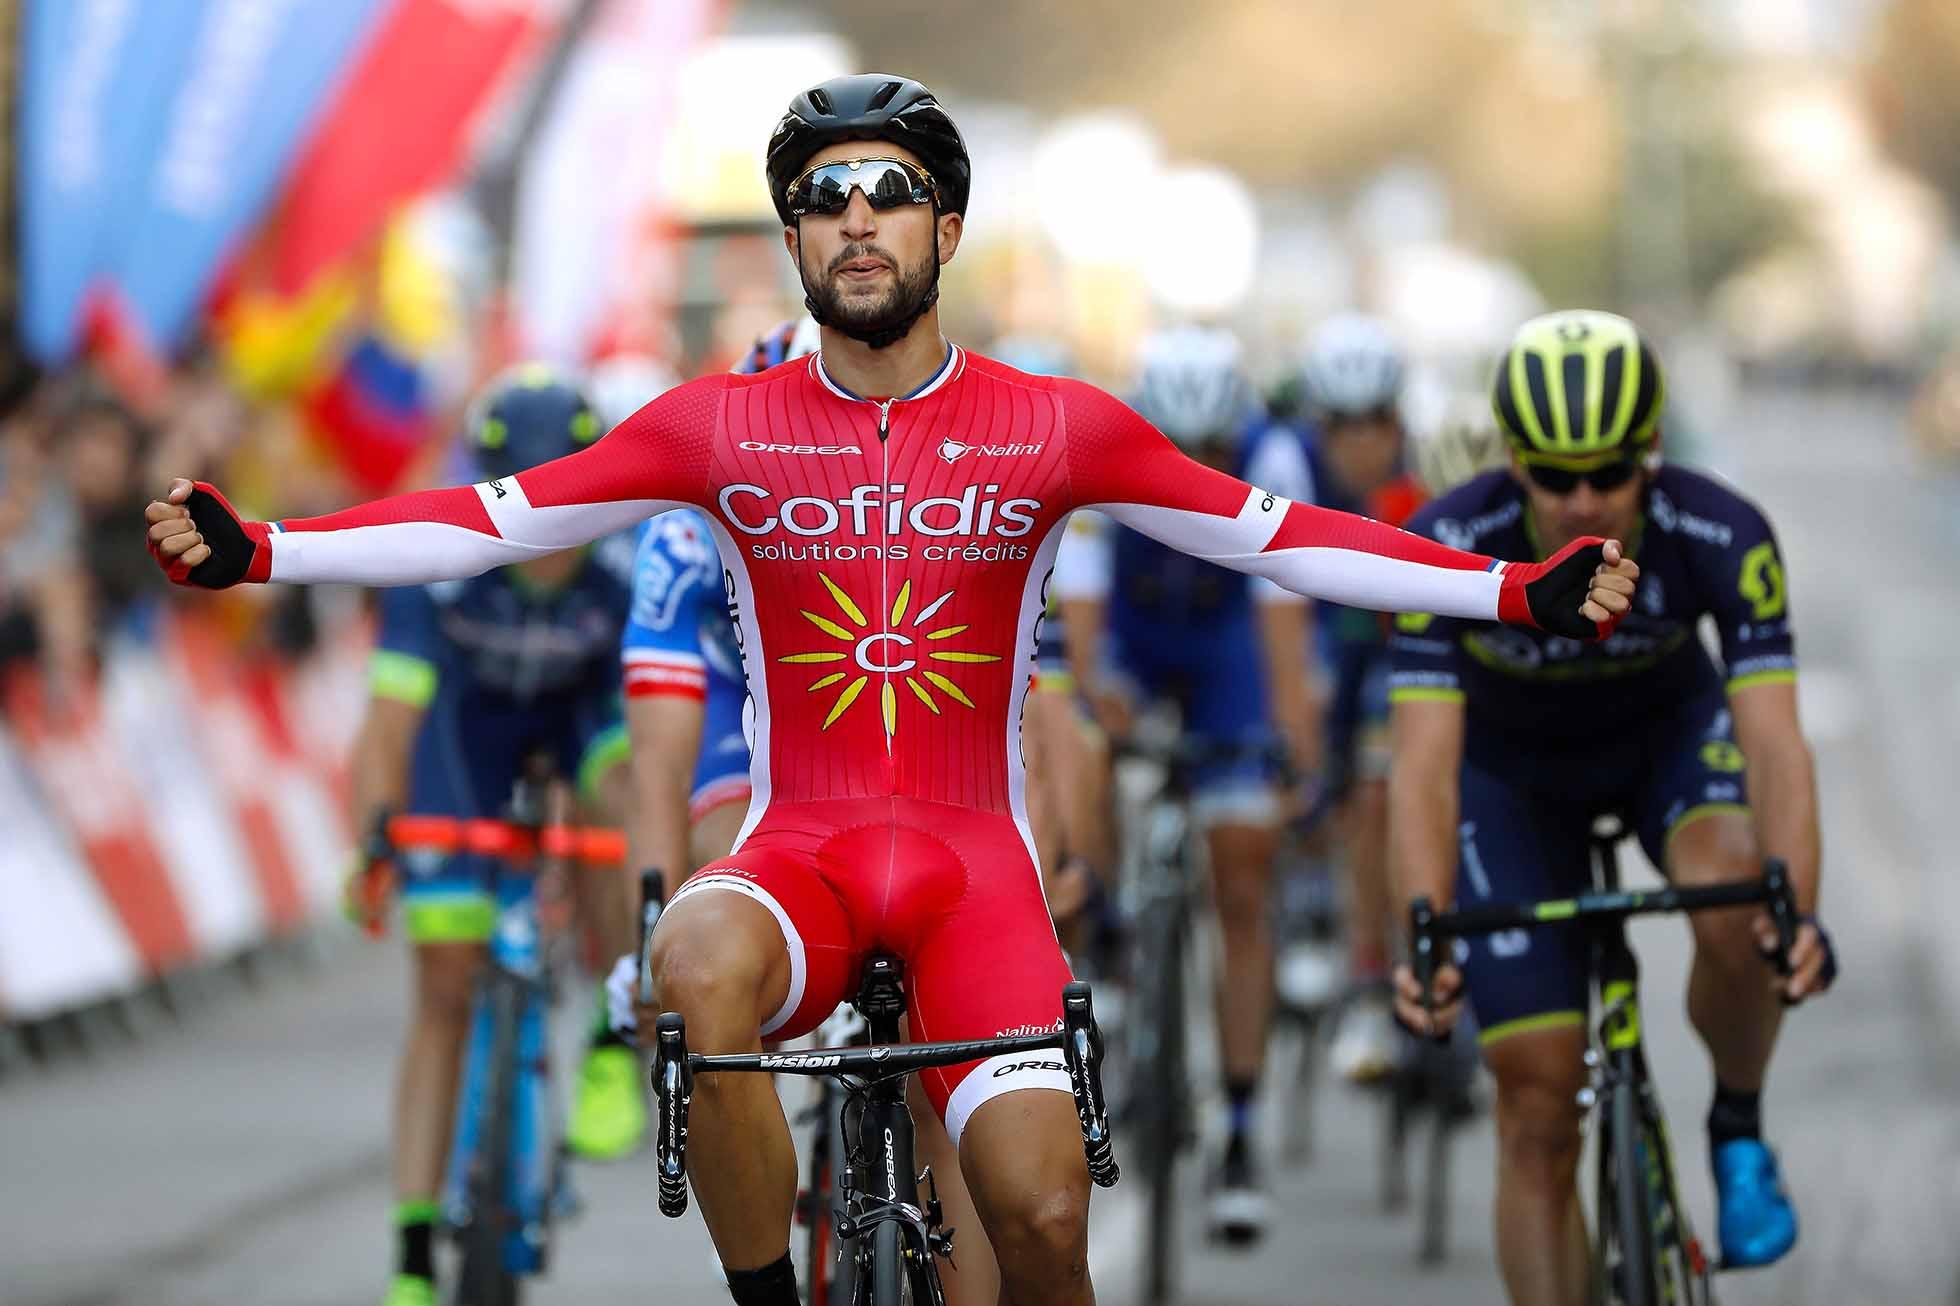 Cycling: 97th Volta Ciclista a Catalunya 2017 / Stage 4 Arrival / Nacer BOUHANNI (FRA)/ Celebration / La Seu d'Urgeil - Igualada (134km)/ Tour of Catalunya / (Photo by PGS/Tim De Waele/Corbis via Getty Images)